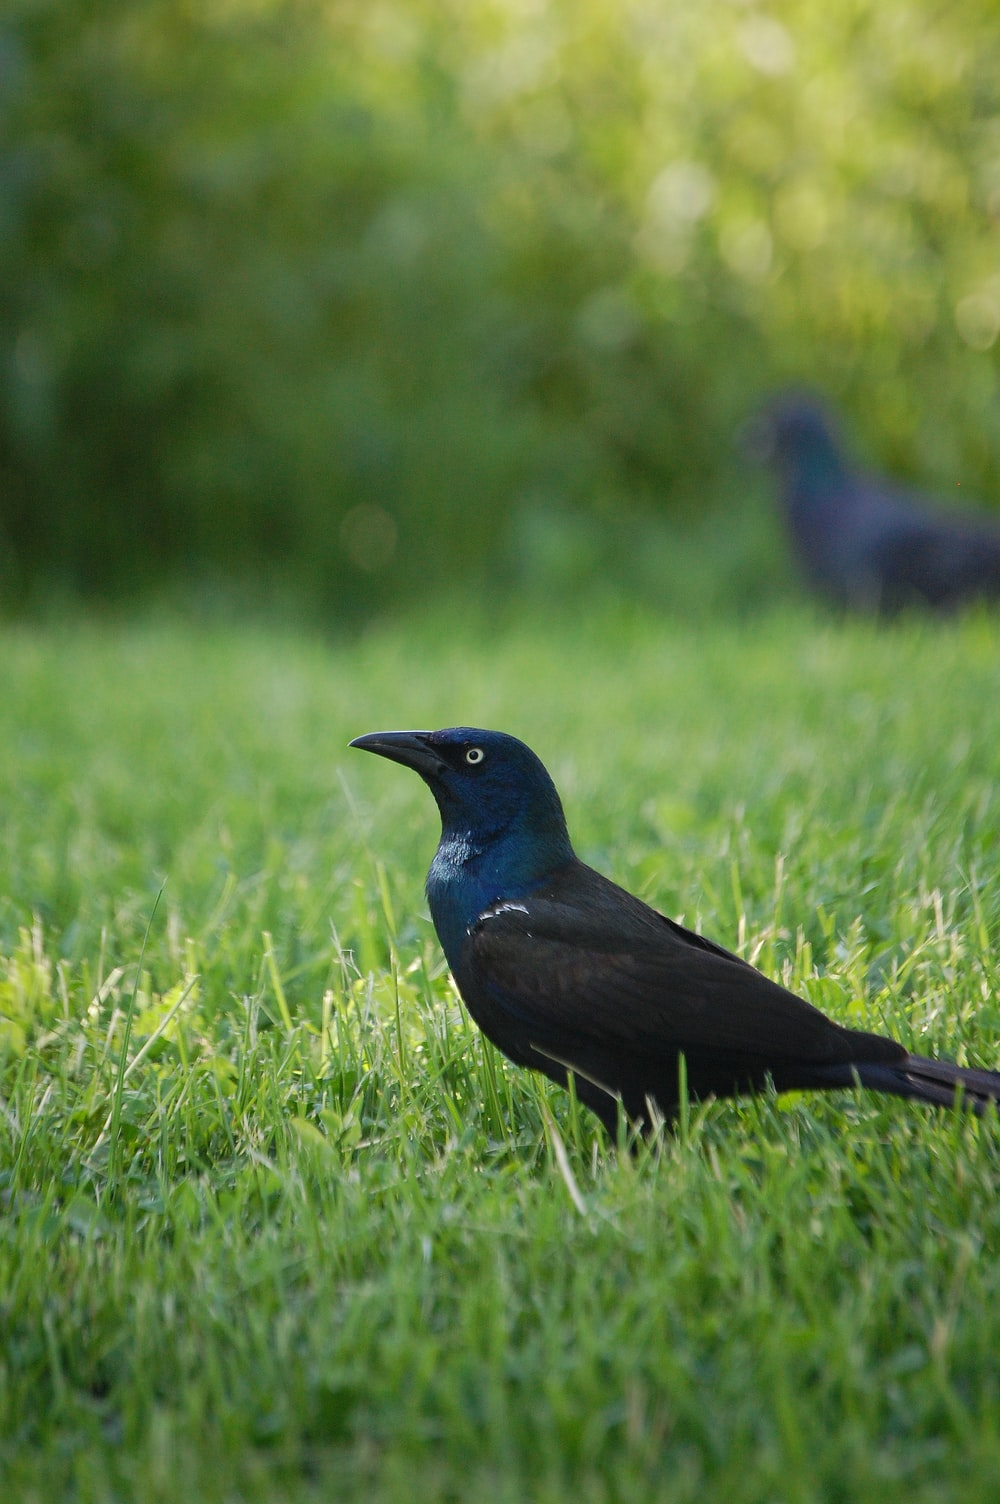 black bird on green grass